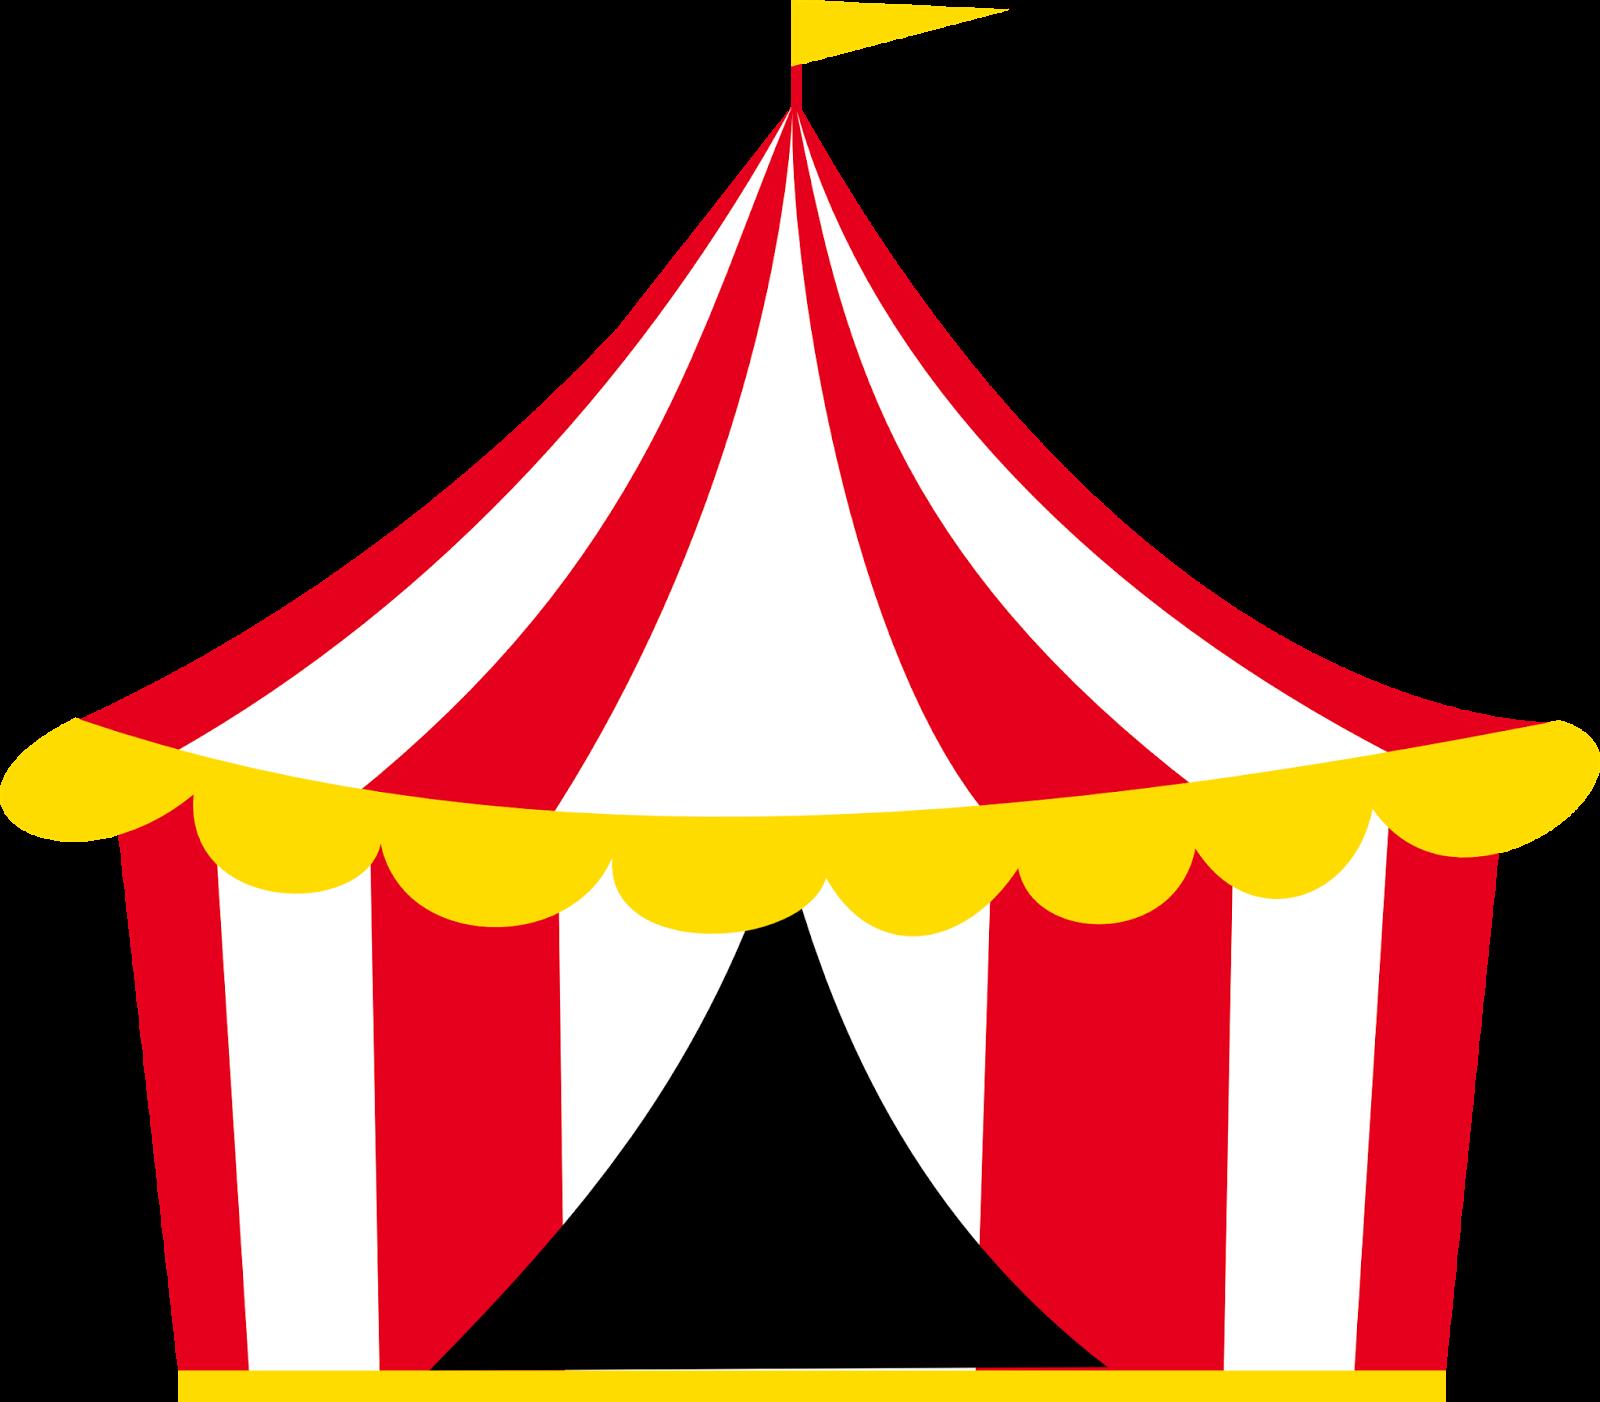 Clipart tent vintage circus, Clipart tent vintage circus ...